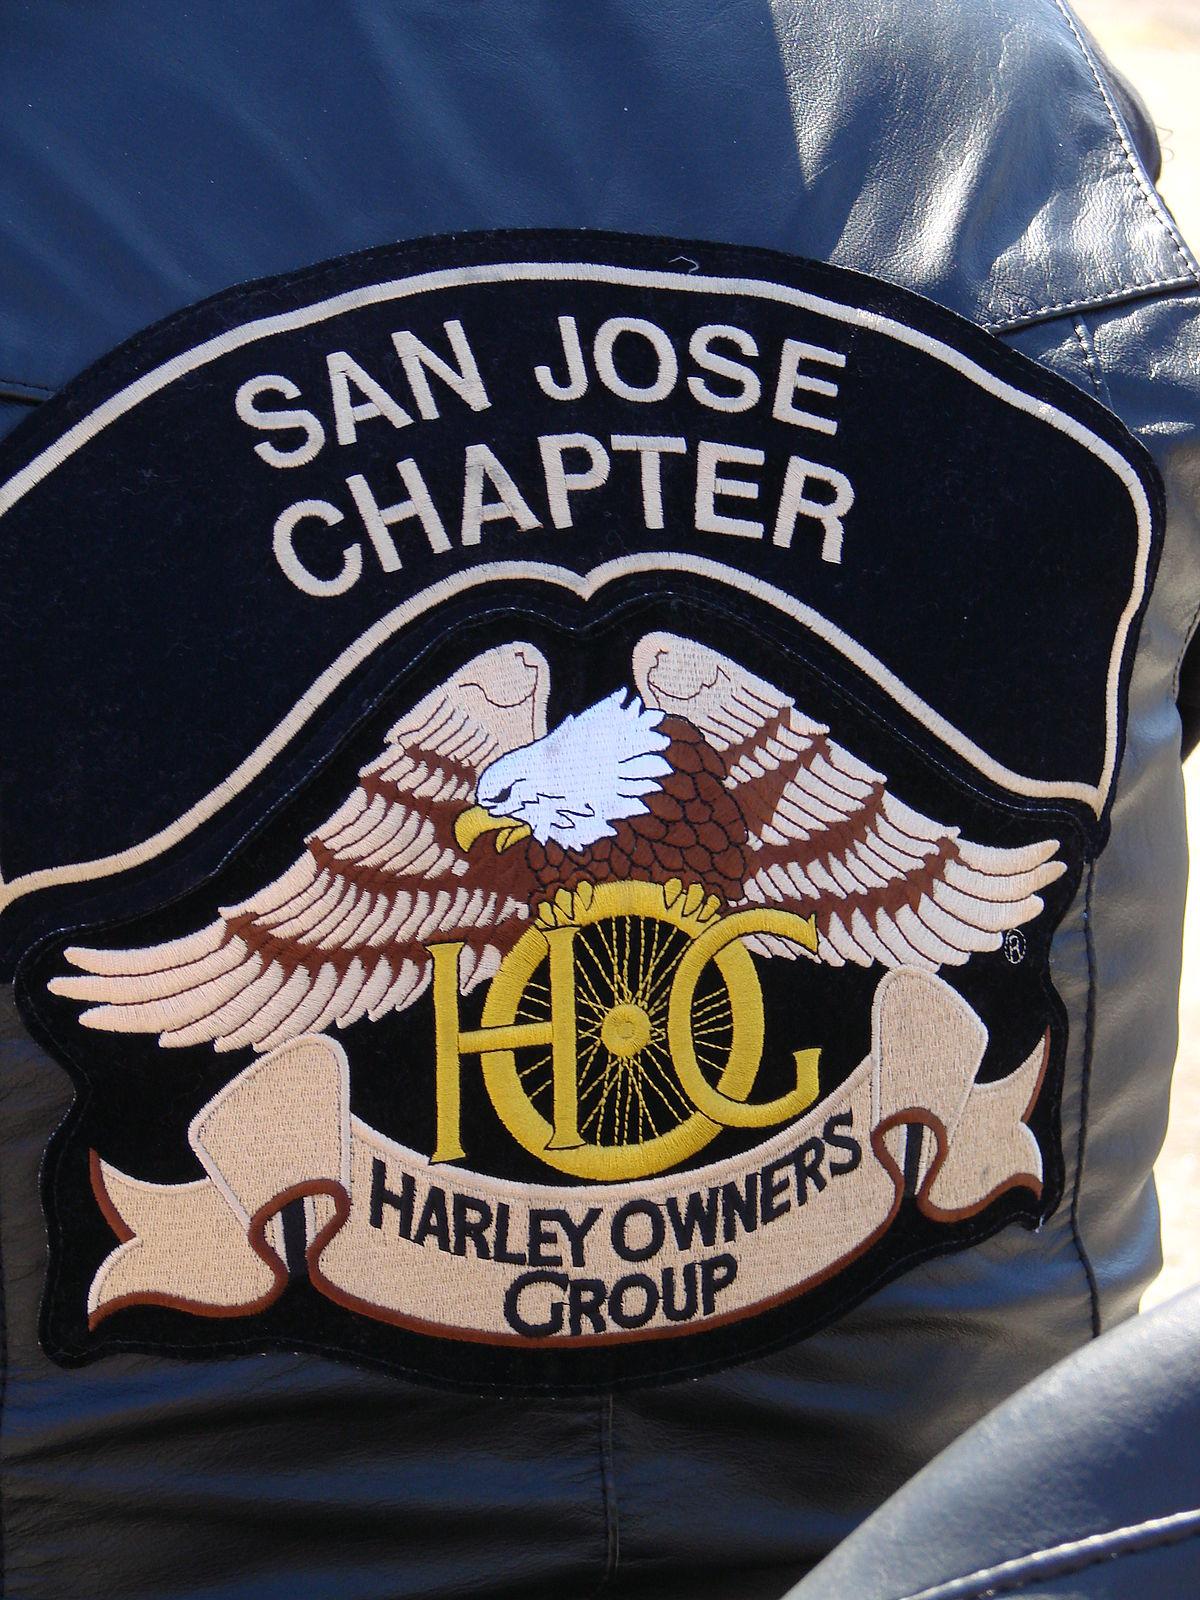 San Jose Harley >> File Harley Owners Group San Jose Chapter Jpg Wikimedia